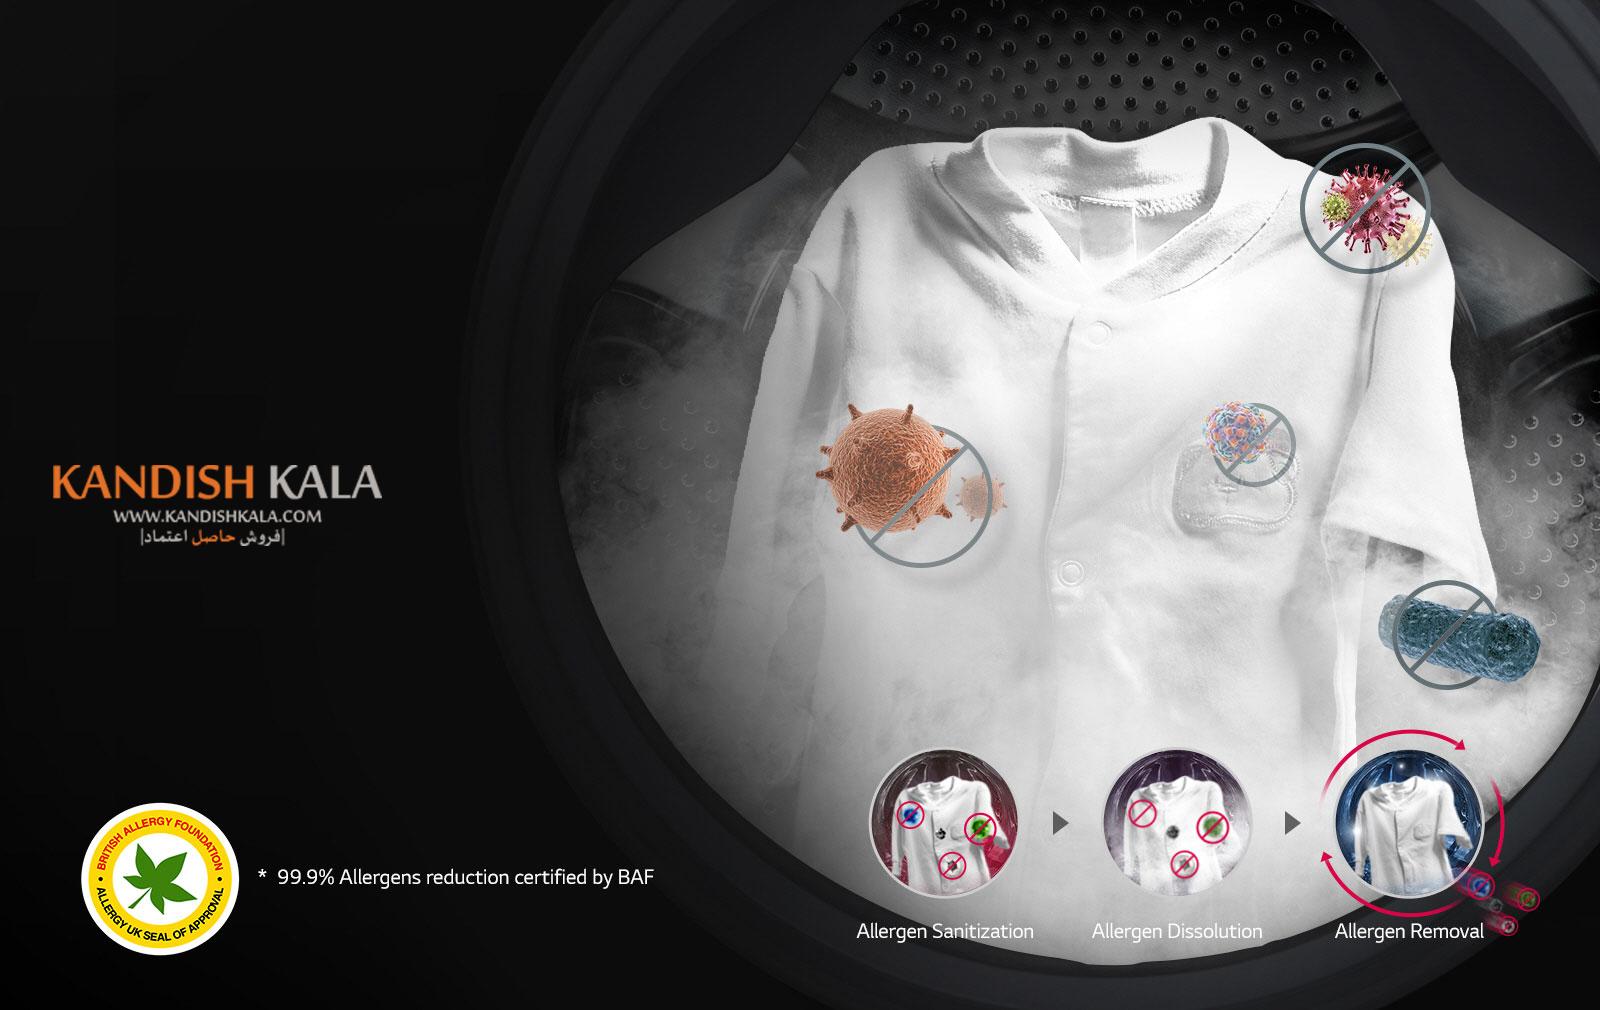 قیمت لباسشویی ال جی 9 کیلو مدل J6